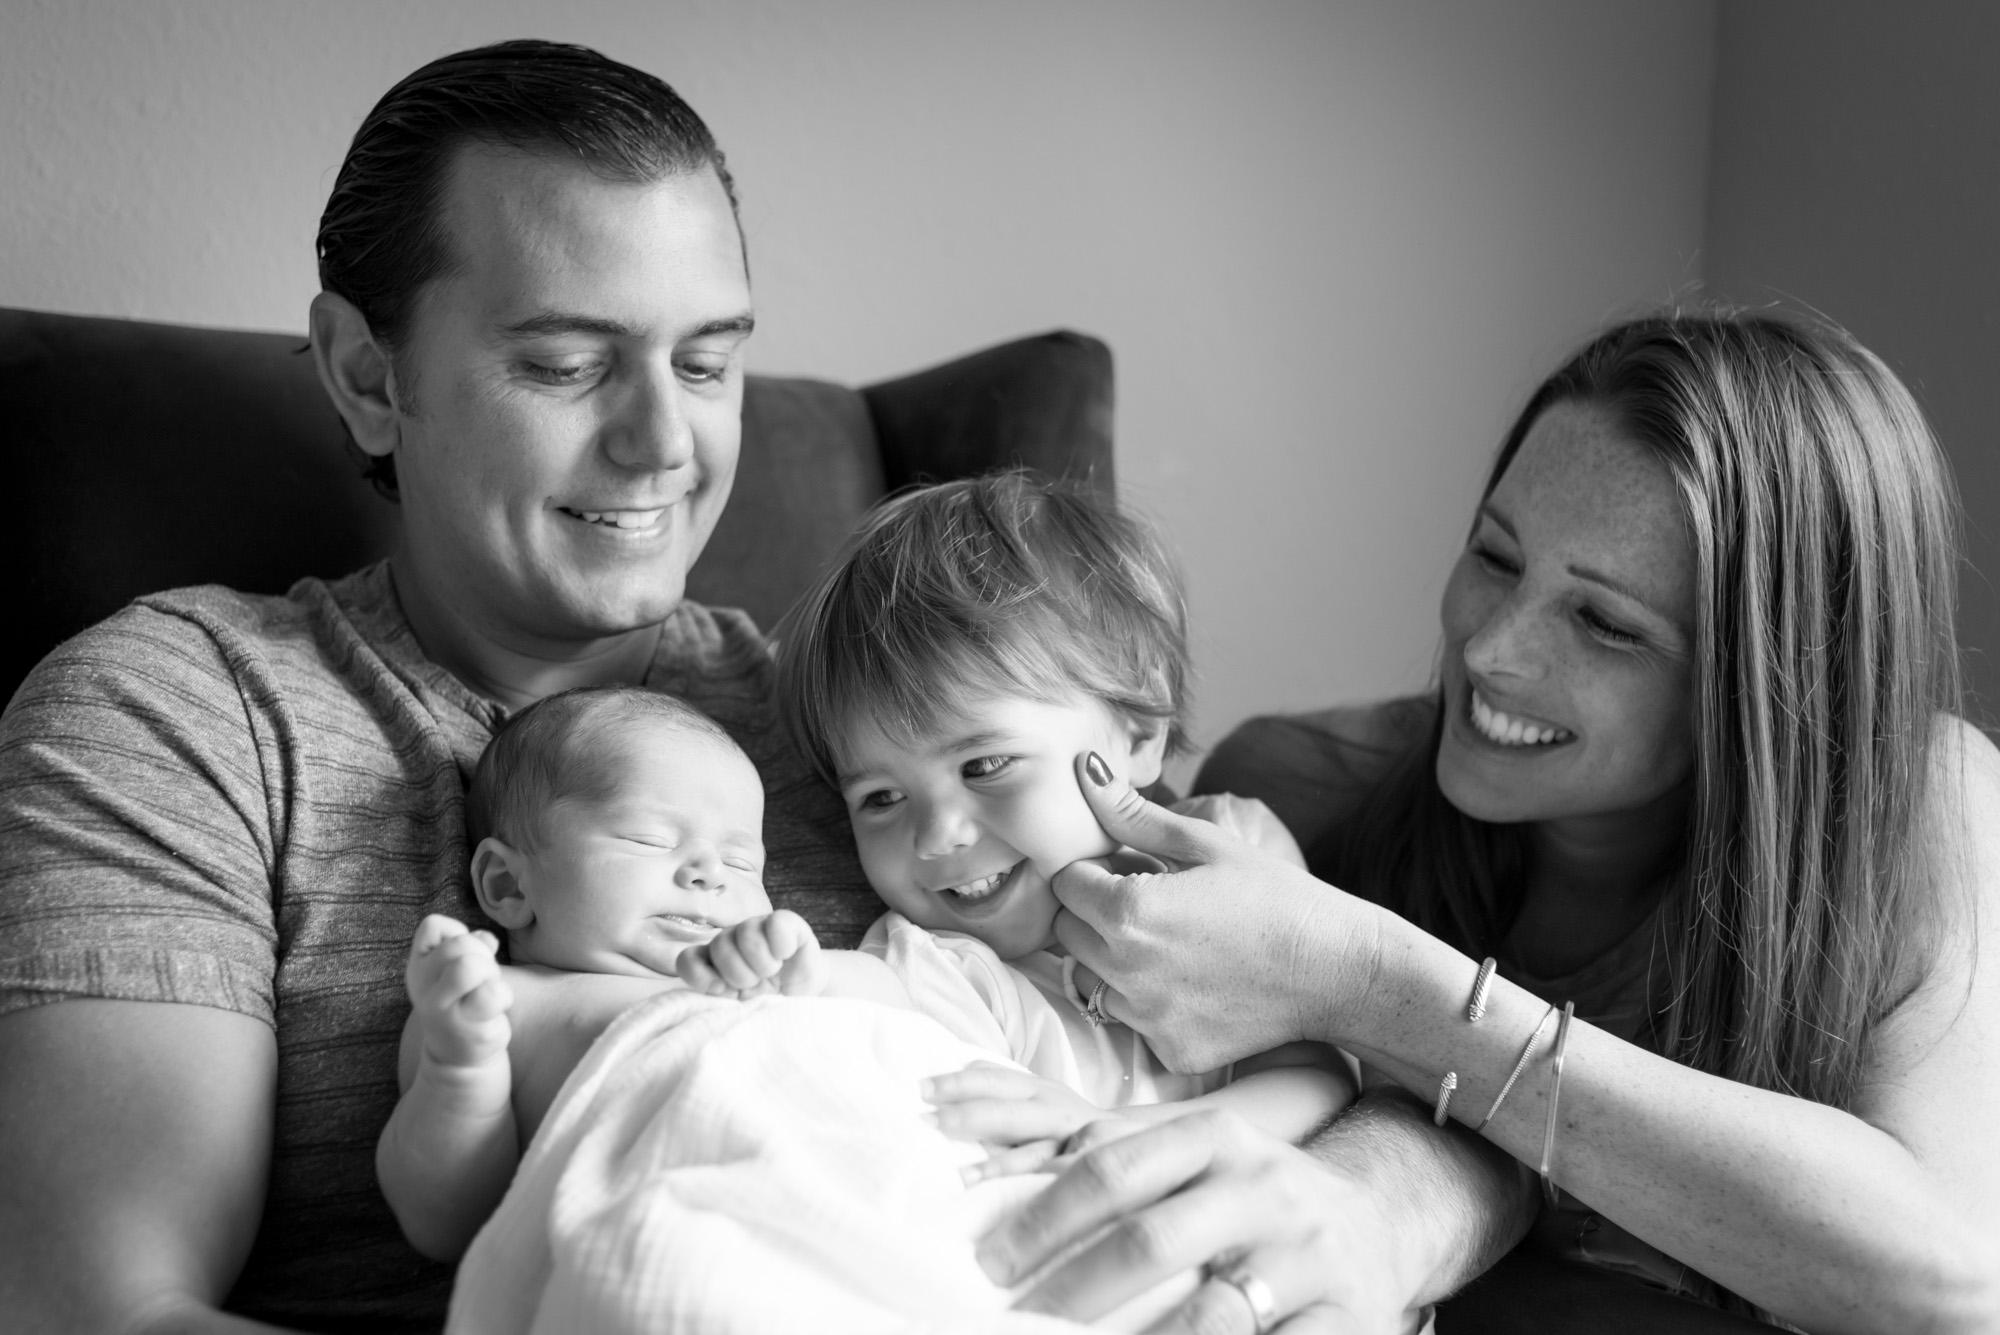 seattle-newborn-family-photography-session-1.jpg